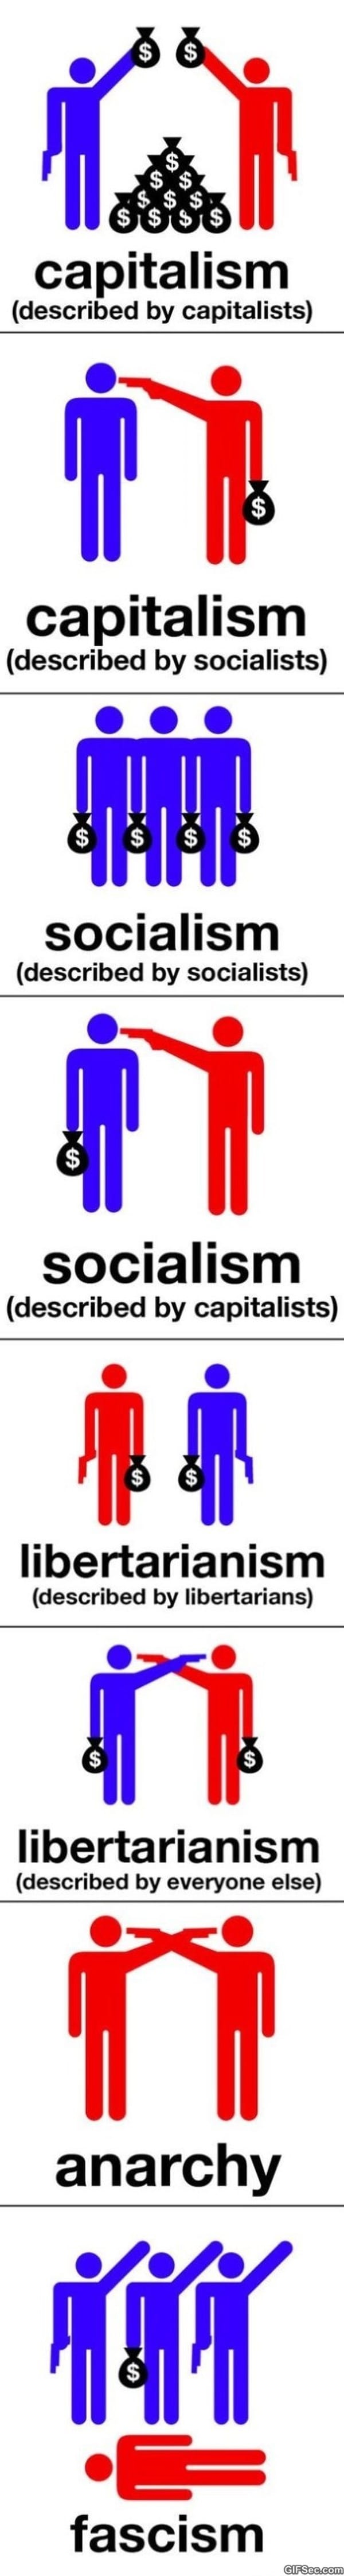 the-economy-at-work-meme